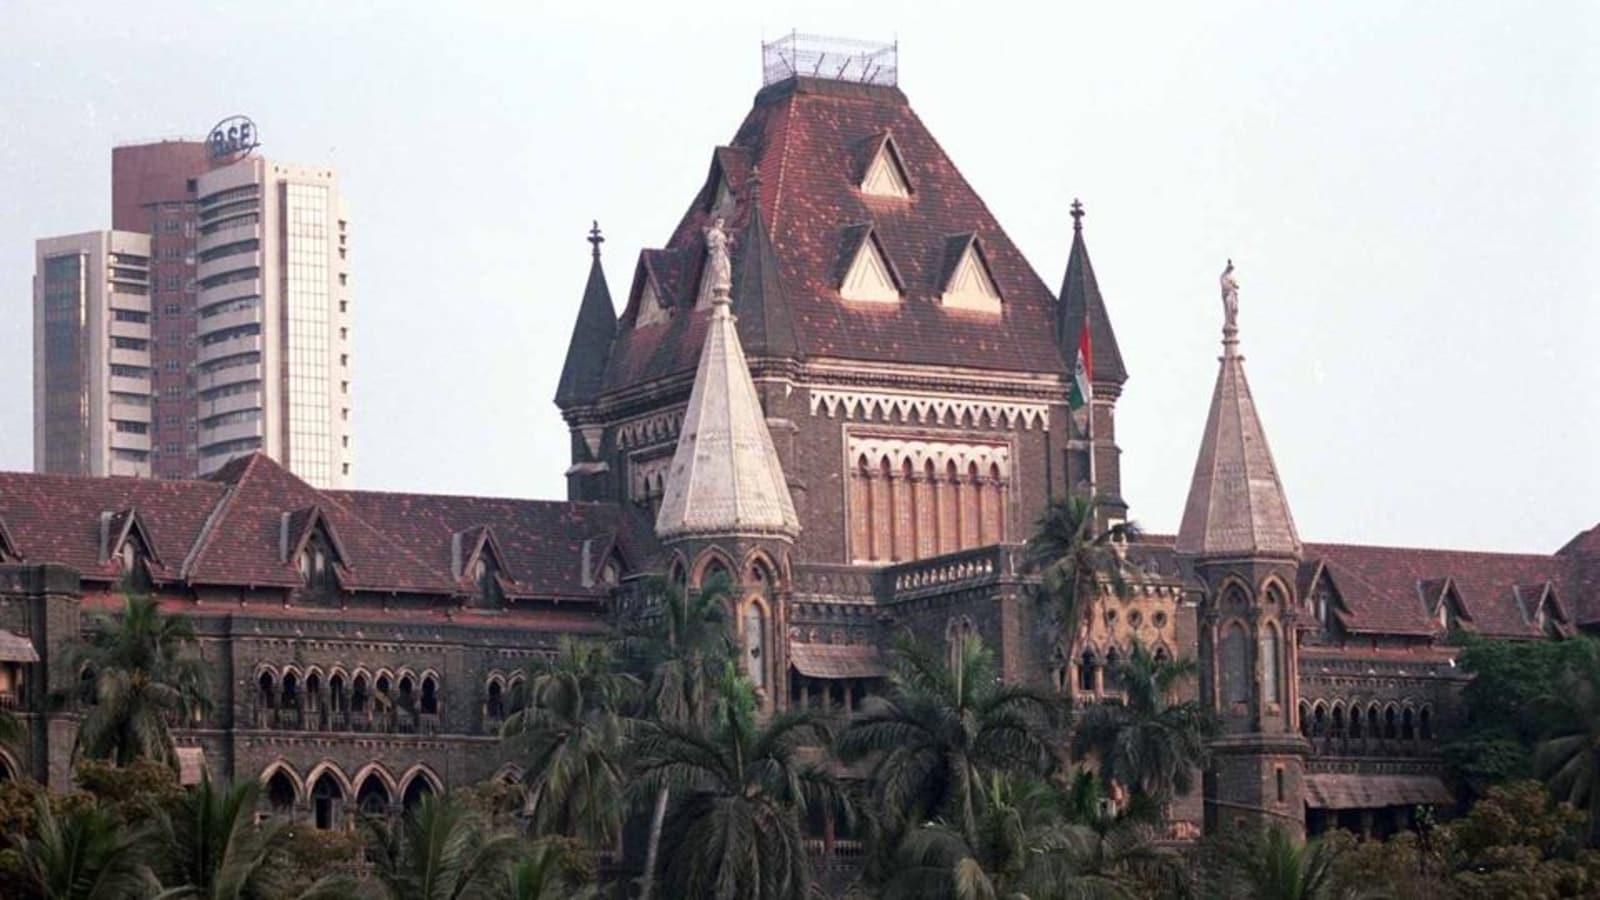 www.hindustantimes.com